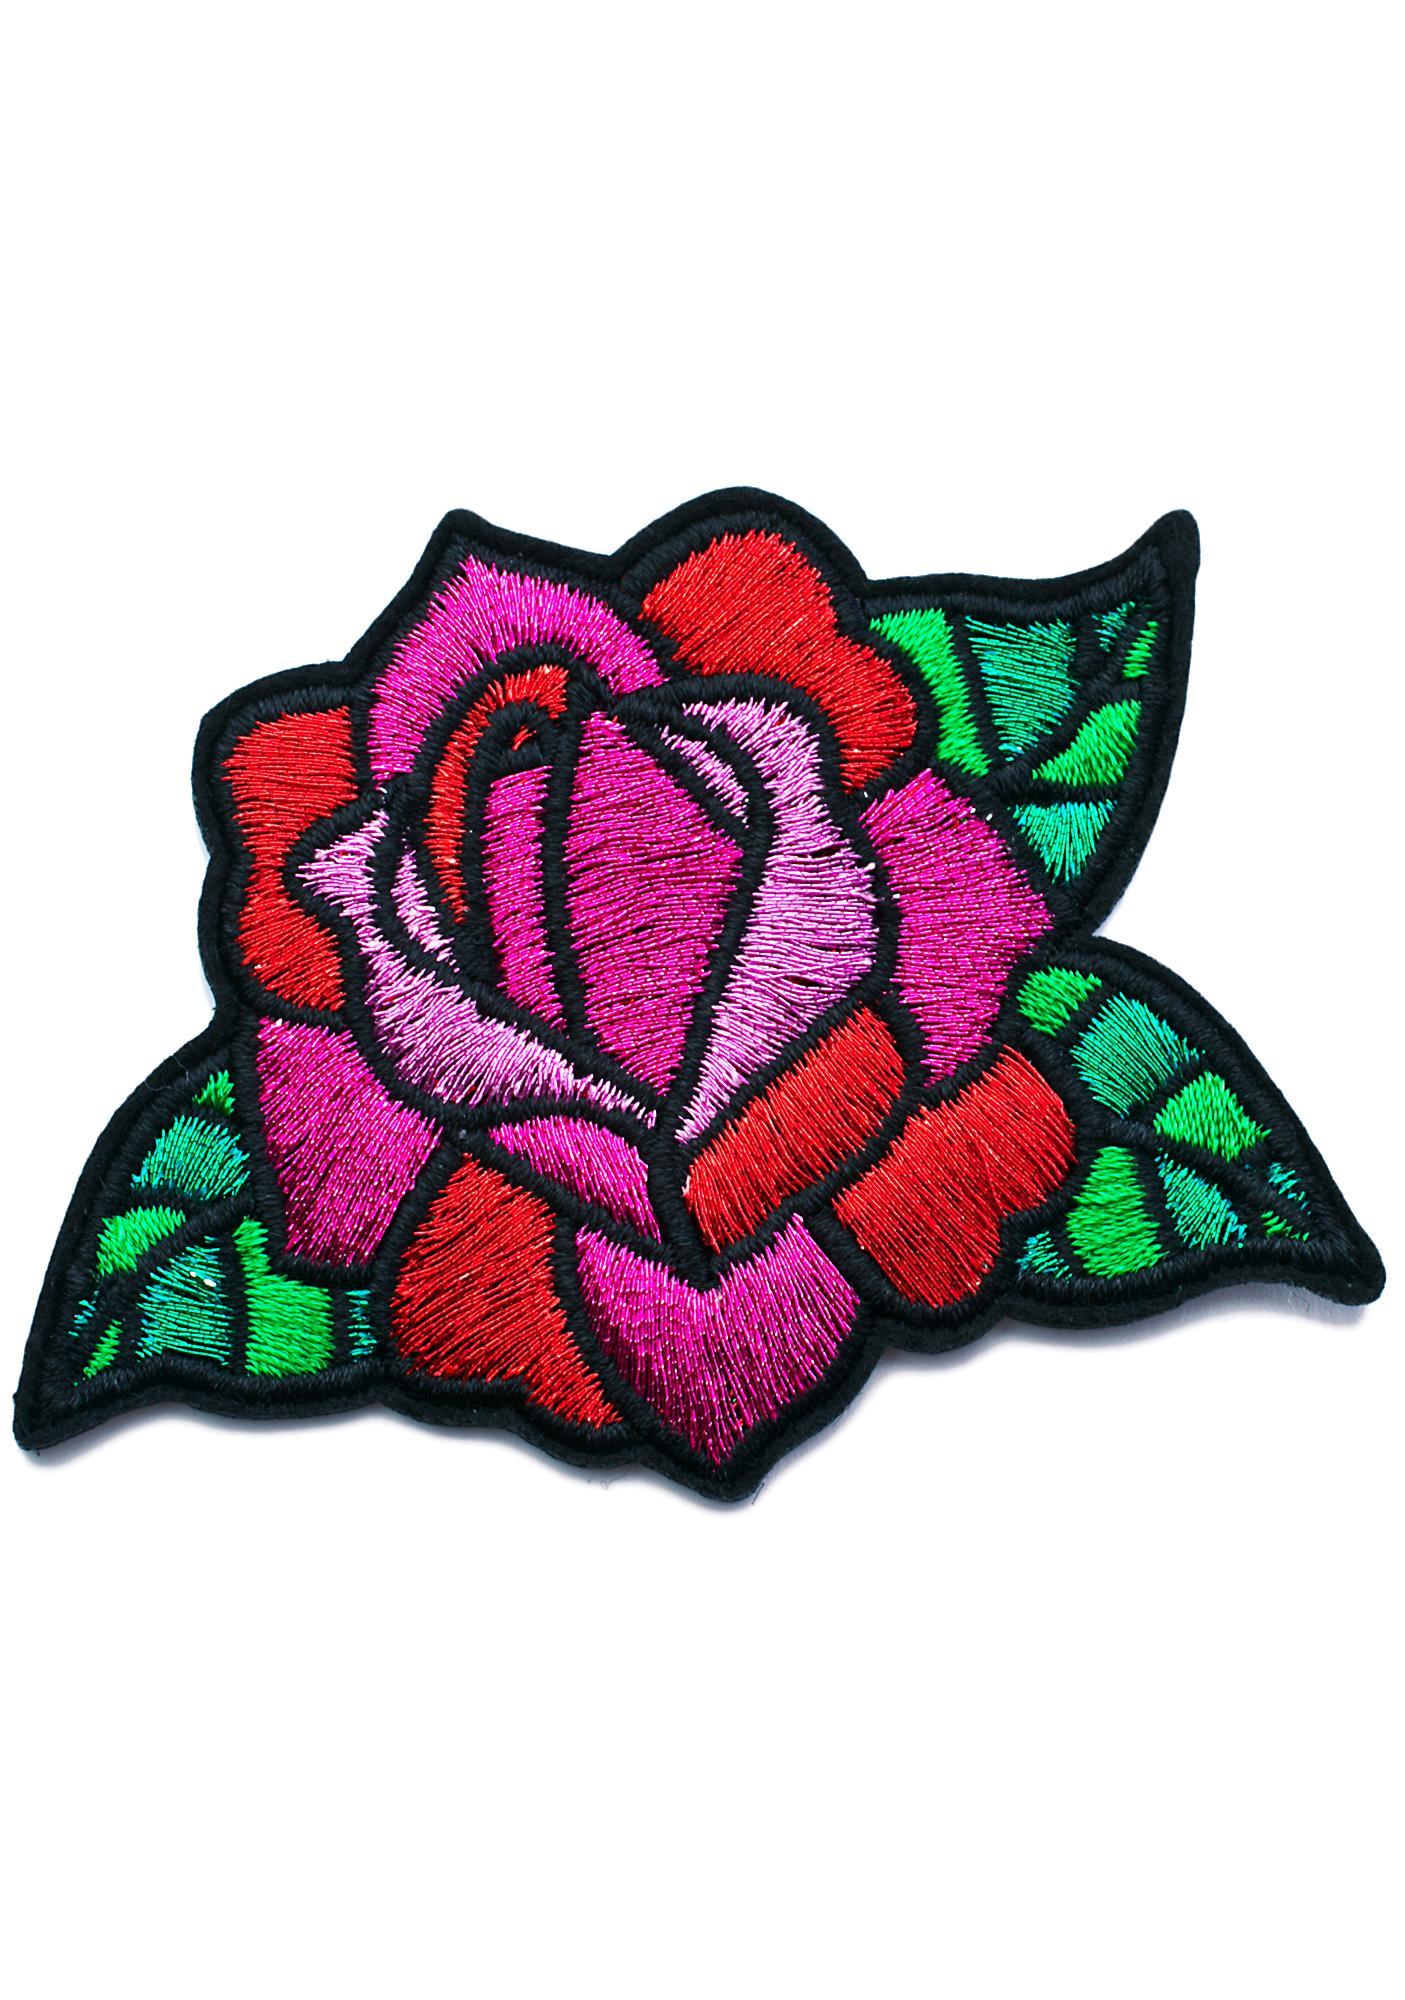 Skinnydip Rose Iron On Patch